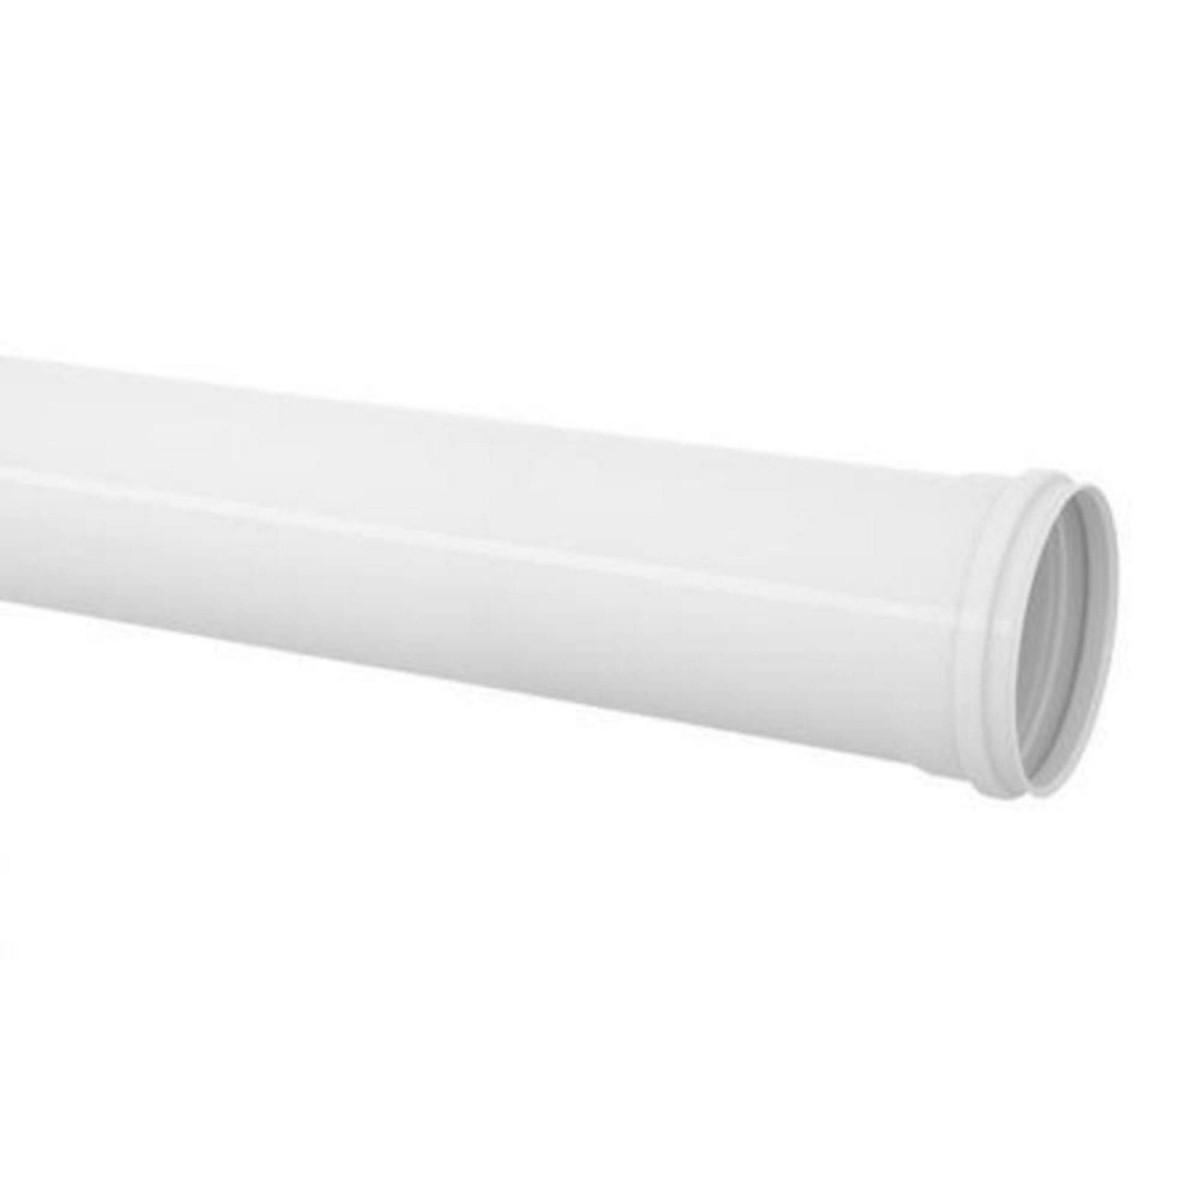 Esgoto Tubo Série Normal 50mm - 2